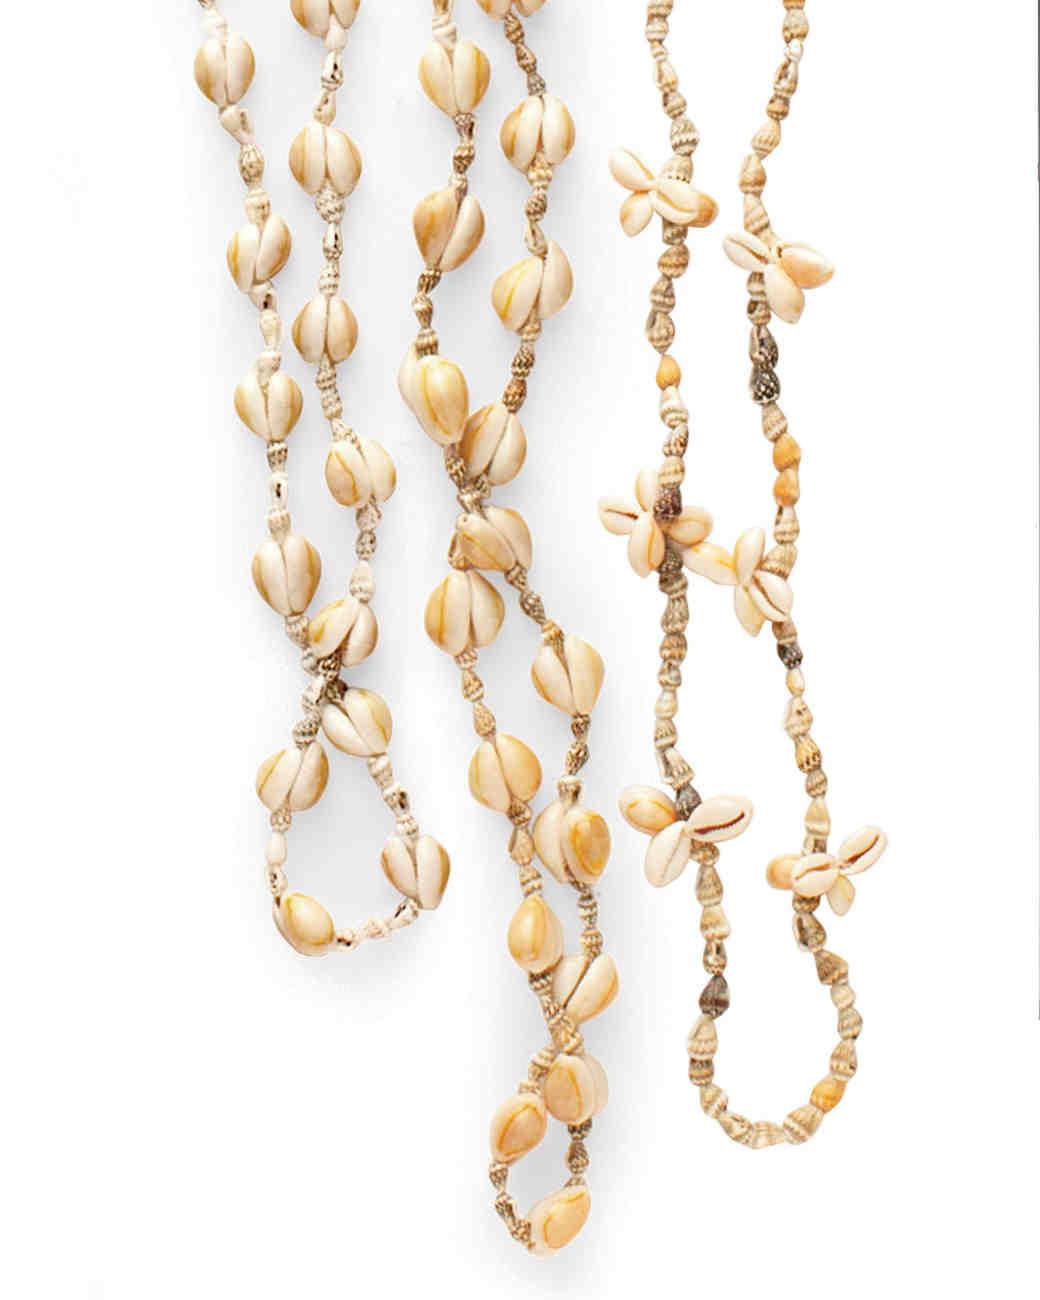 travel-necklace-mwd107931.jpg